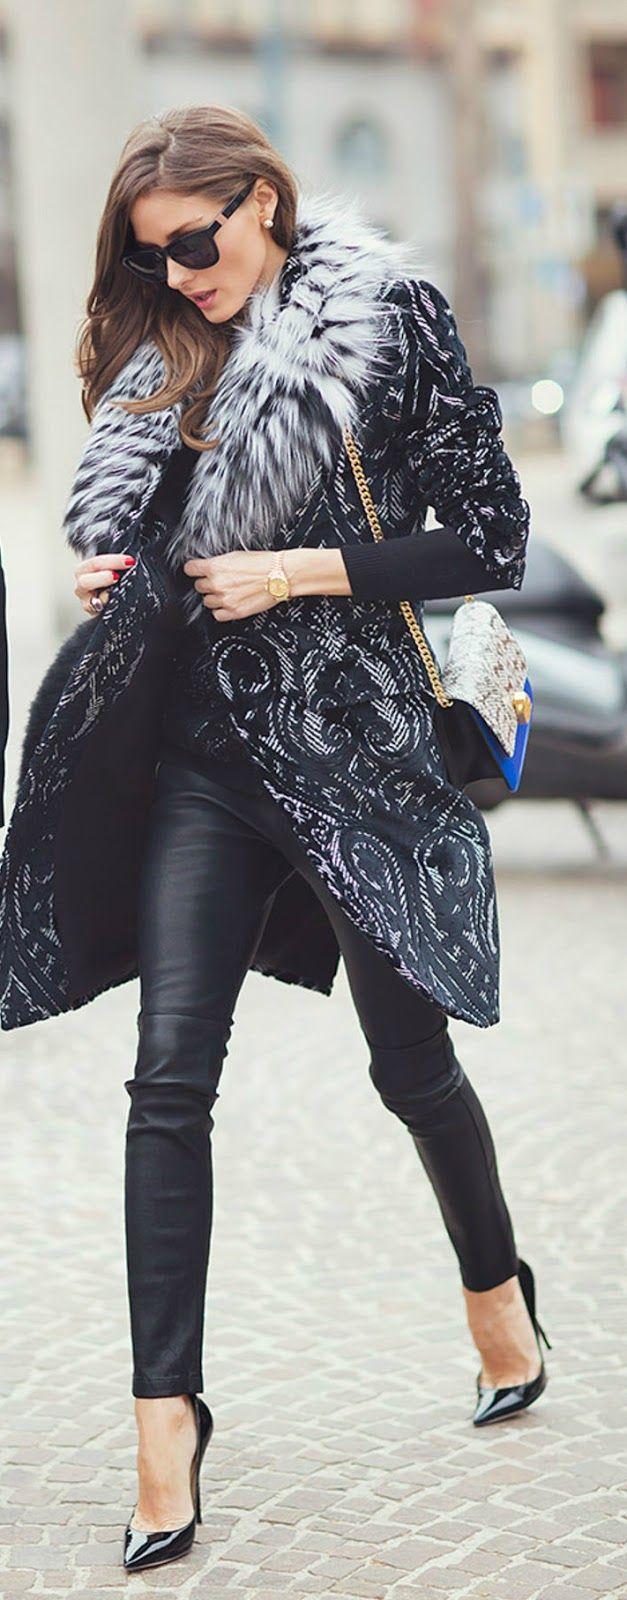 The Olivia Palermo Lookbook : MFW 2013: Olivia Palermo at Roberto Cavalli